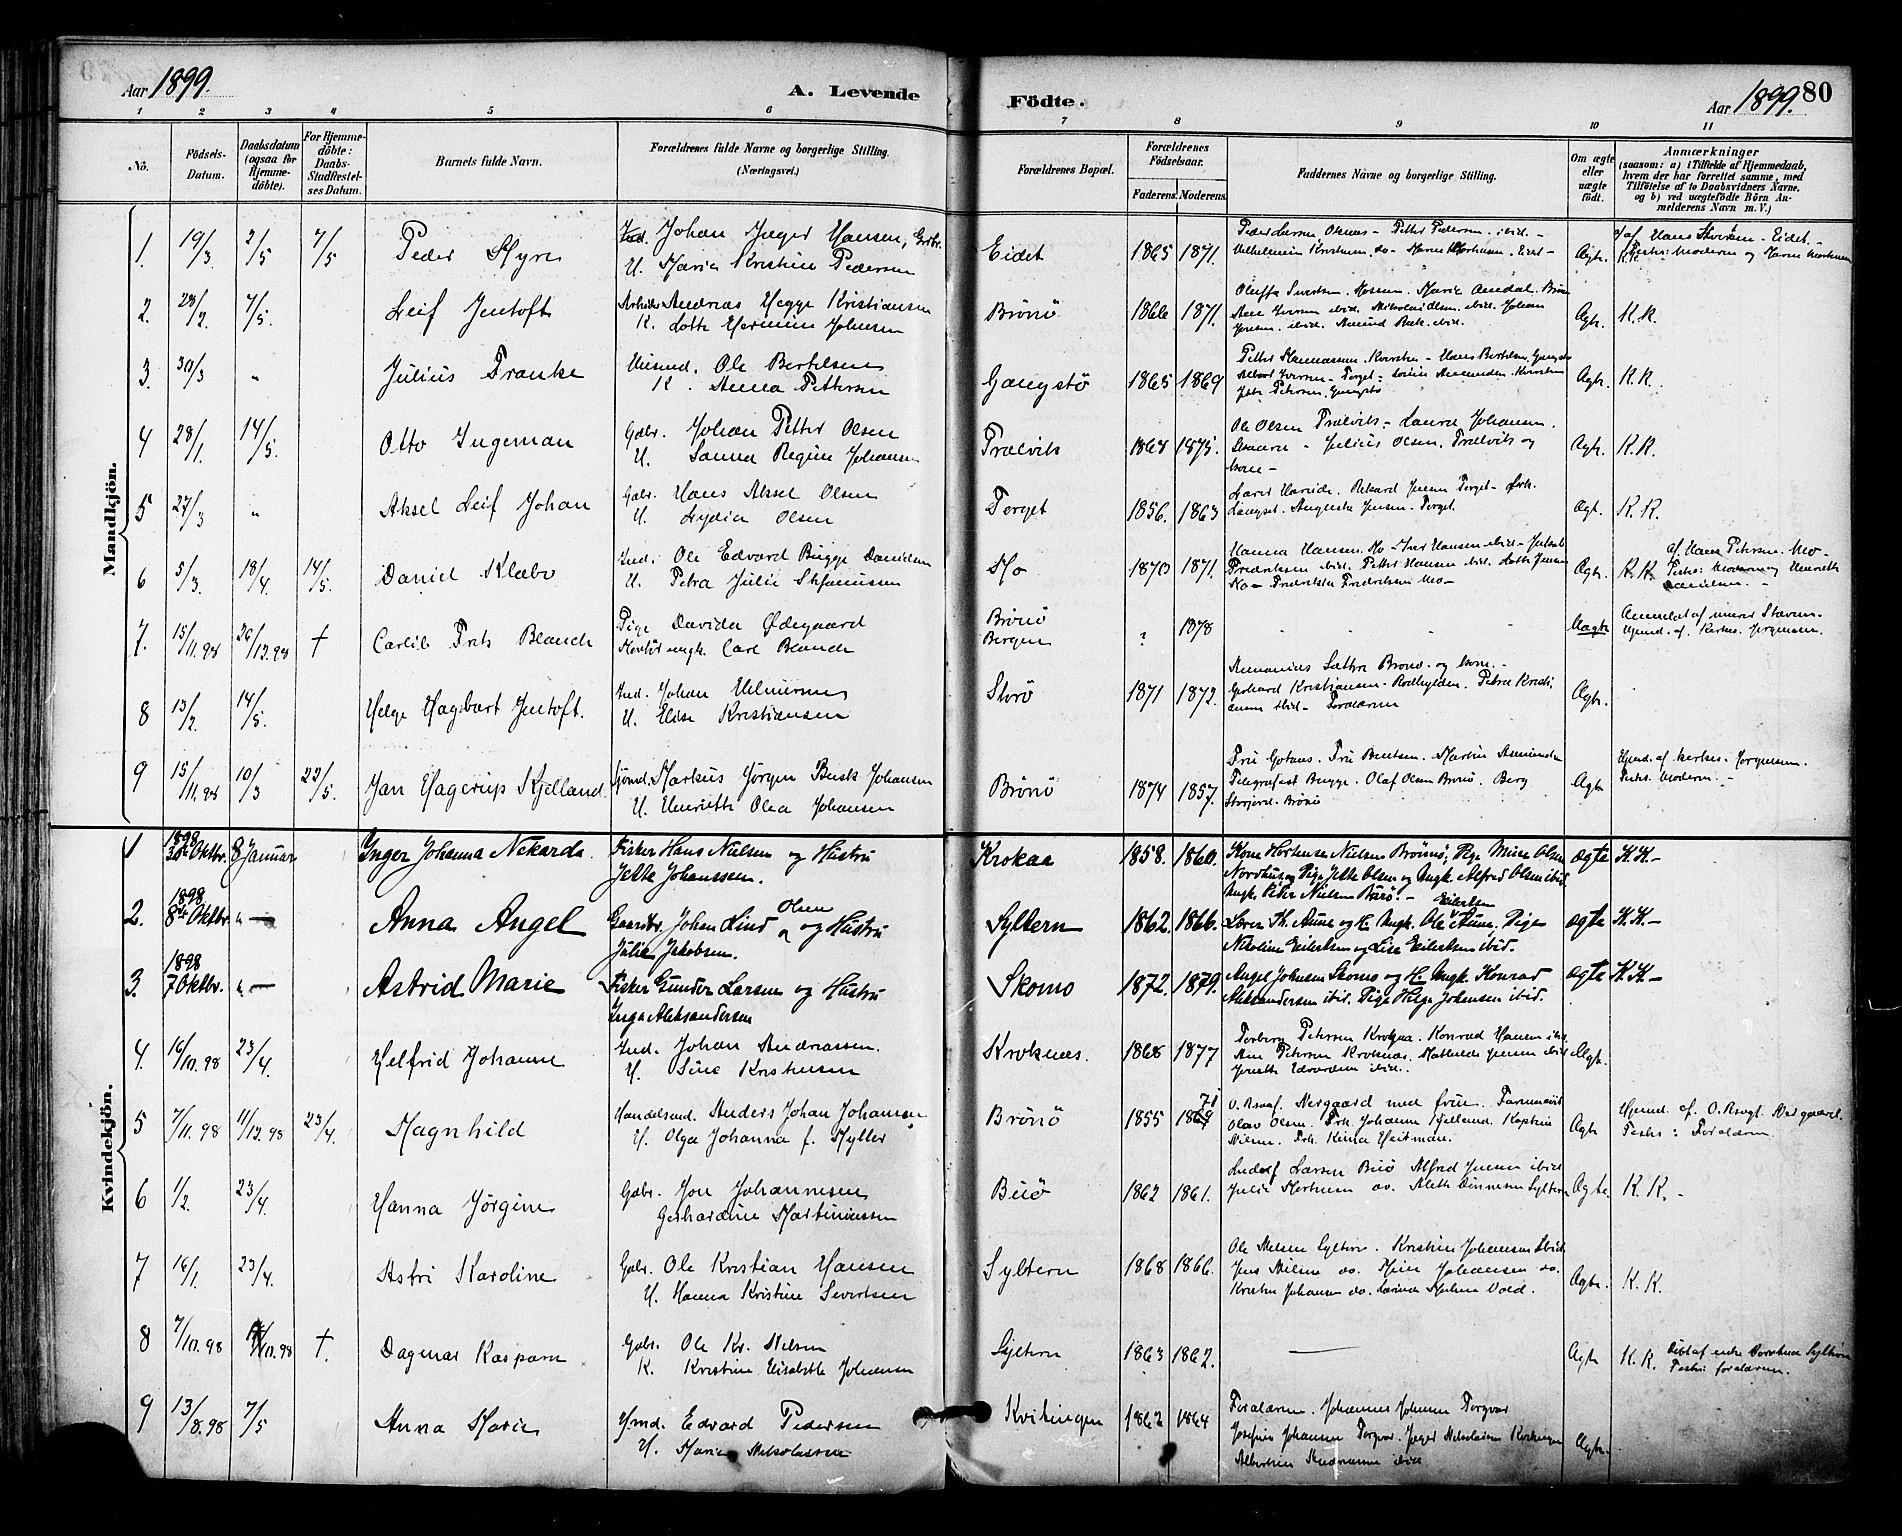 SAT, Ministerialprotokoller, klokkerbøker og fødselsregistre - Nordland, 813/L0200: Ministerialbok nr. 813A10, 1886-1900, s. 80